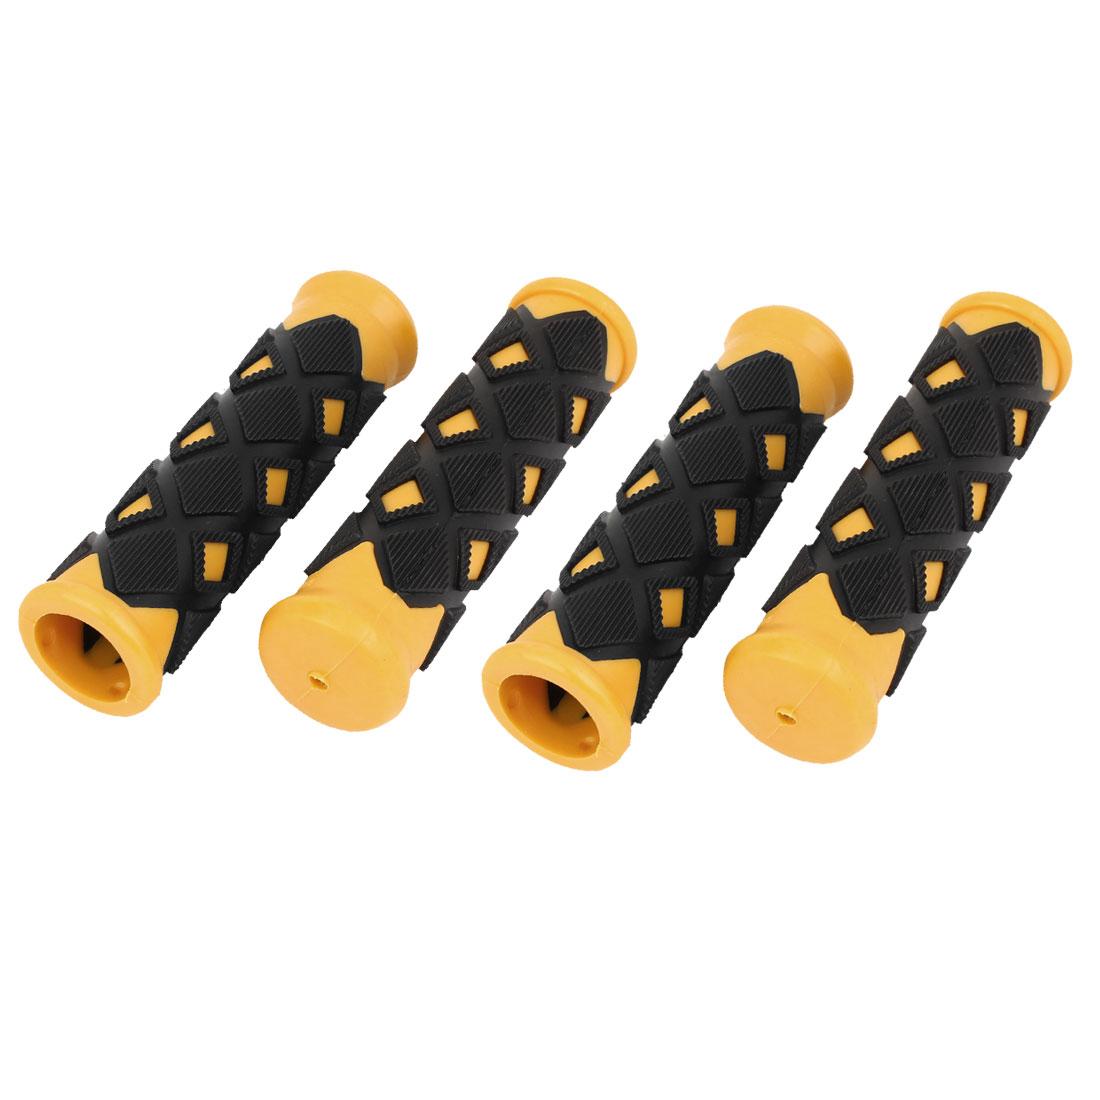 4 Pcs Lozenge Shaped Black Yellow Rubber Non Slip Bike Bicycle Handlebar Grip